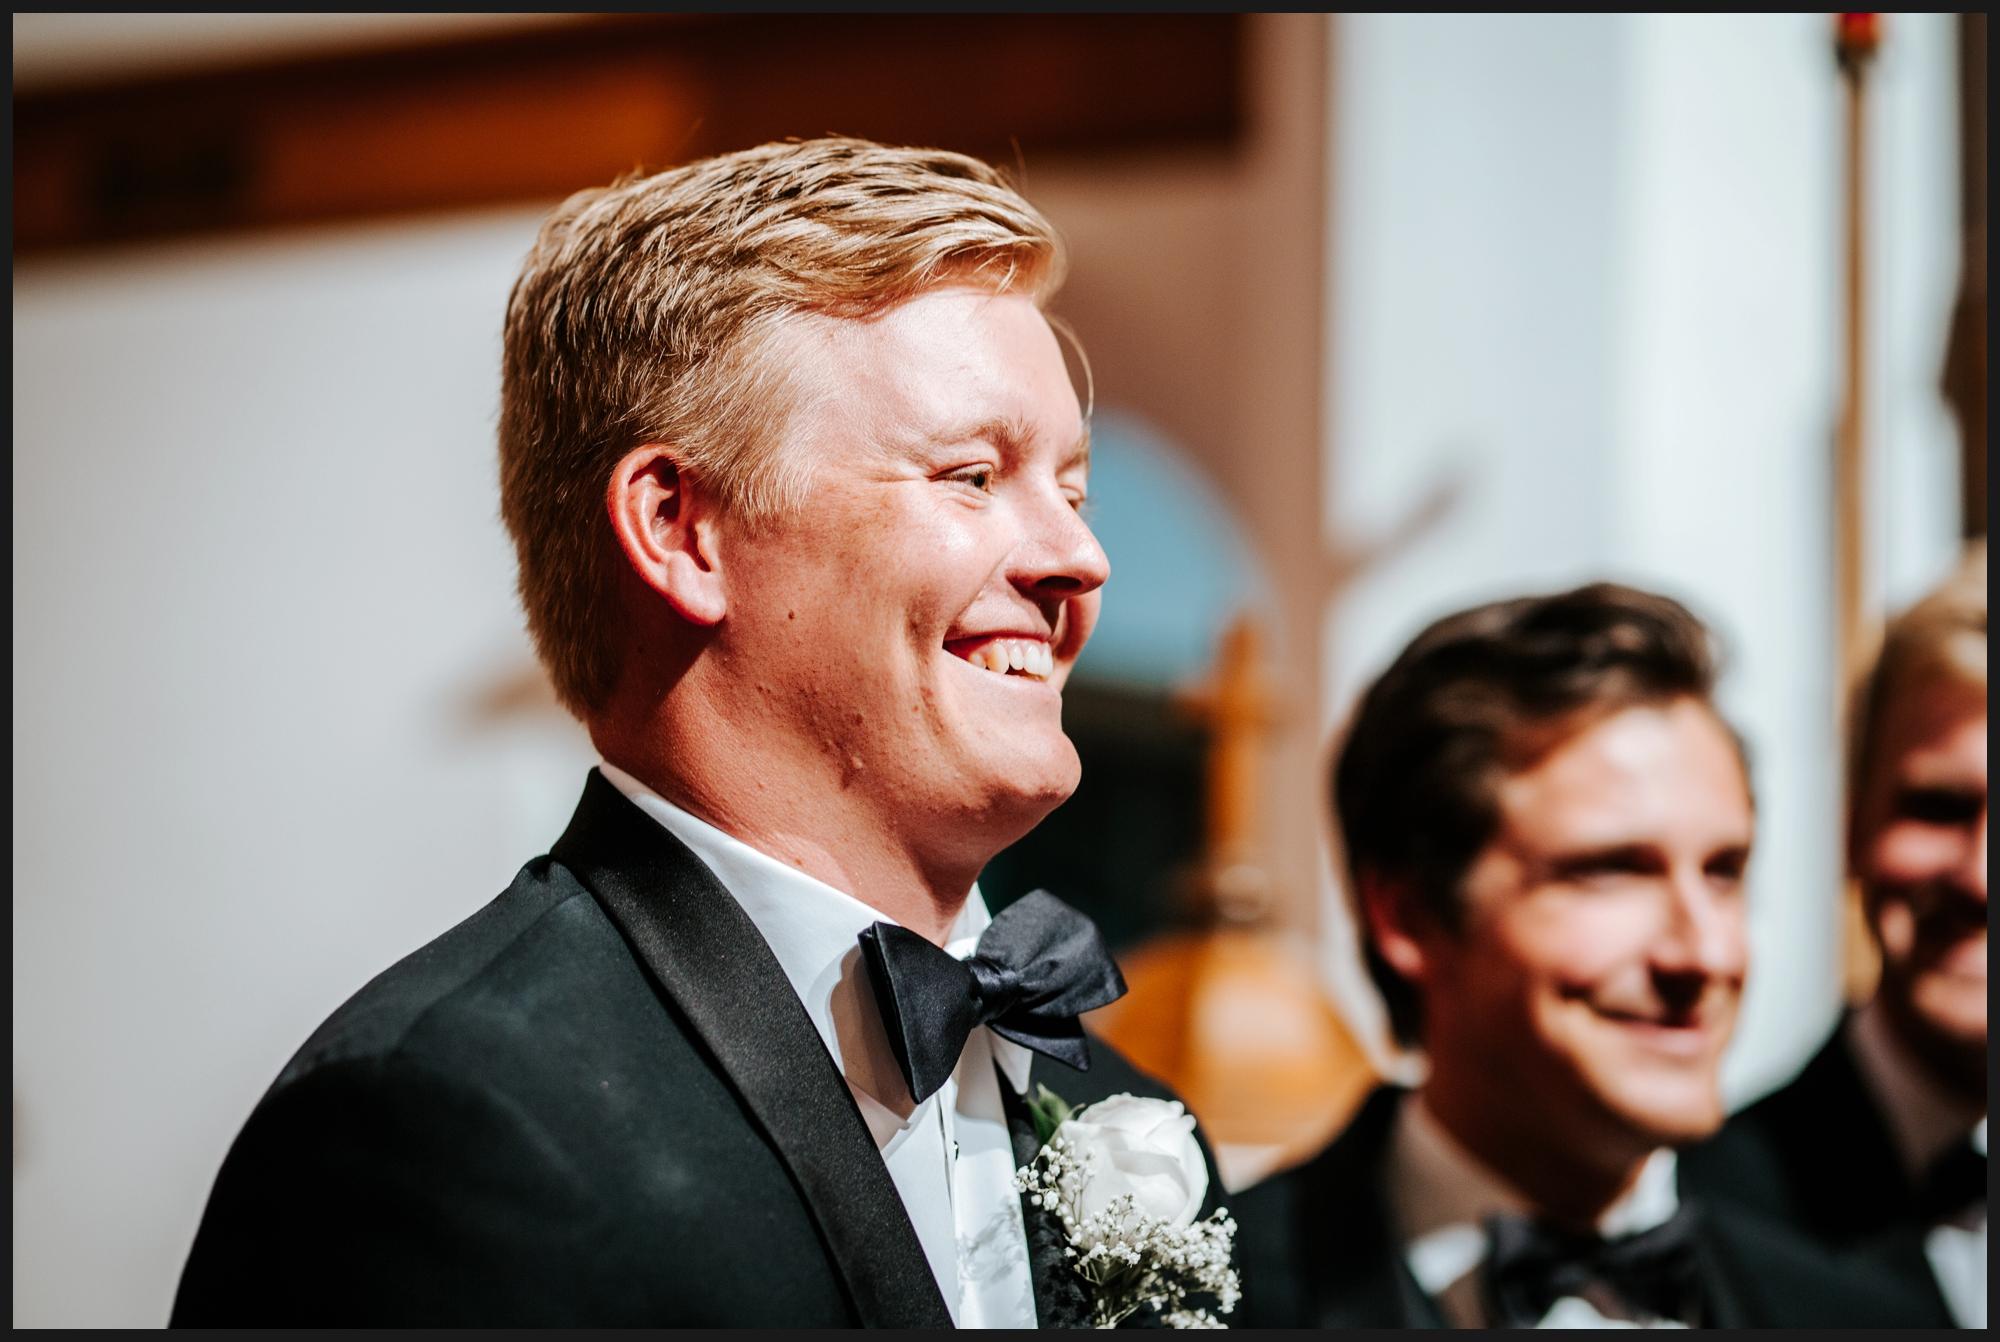 Orlando-Wedding-Photographer-destination-wedding-photographer-florida-wedding-photographer-bohemian-wedding-photographer_0055.jpg